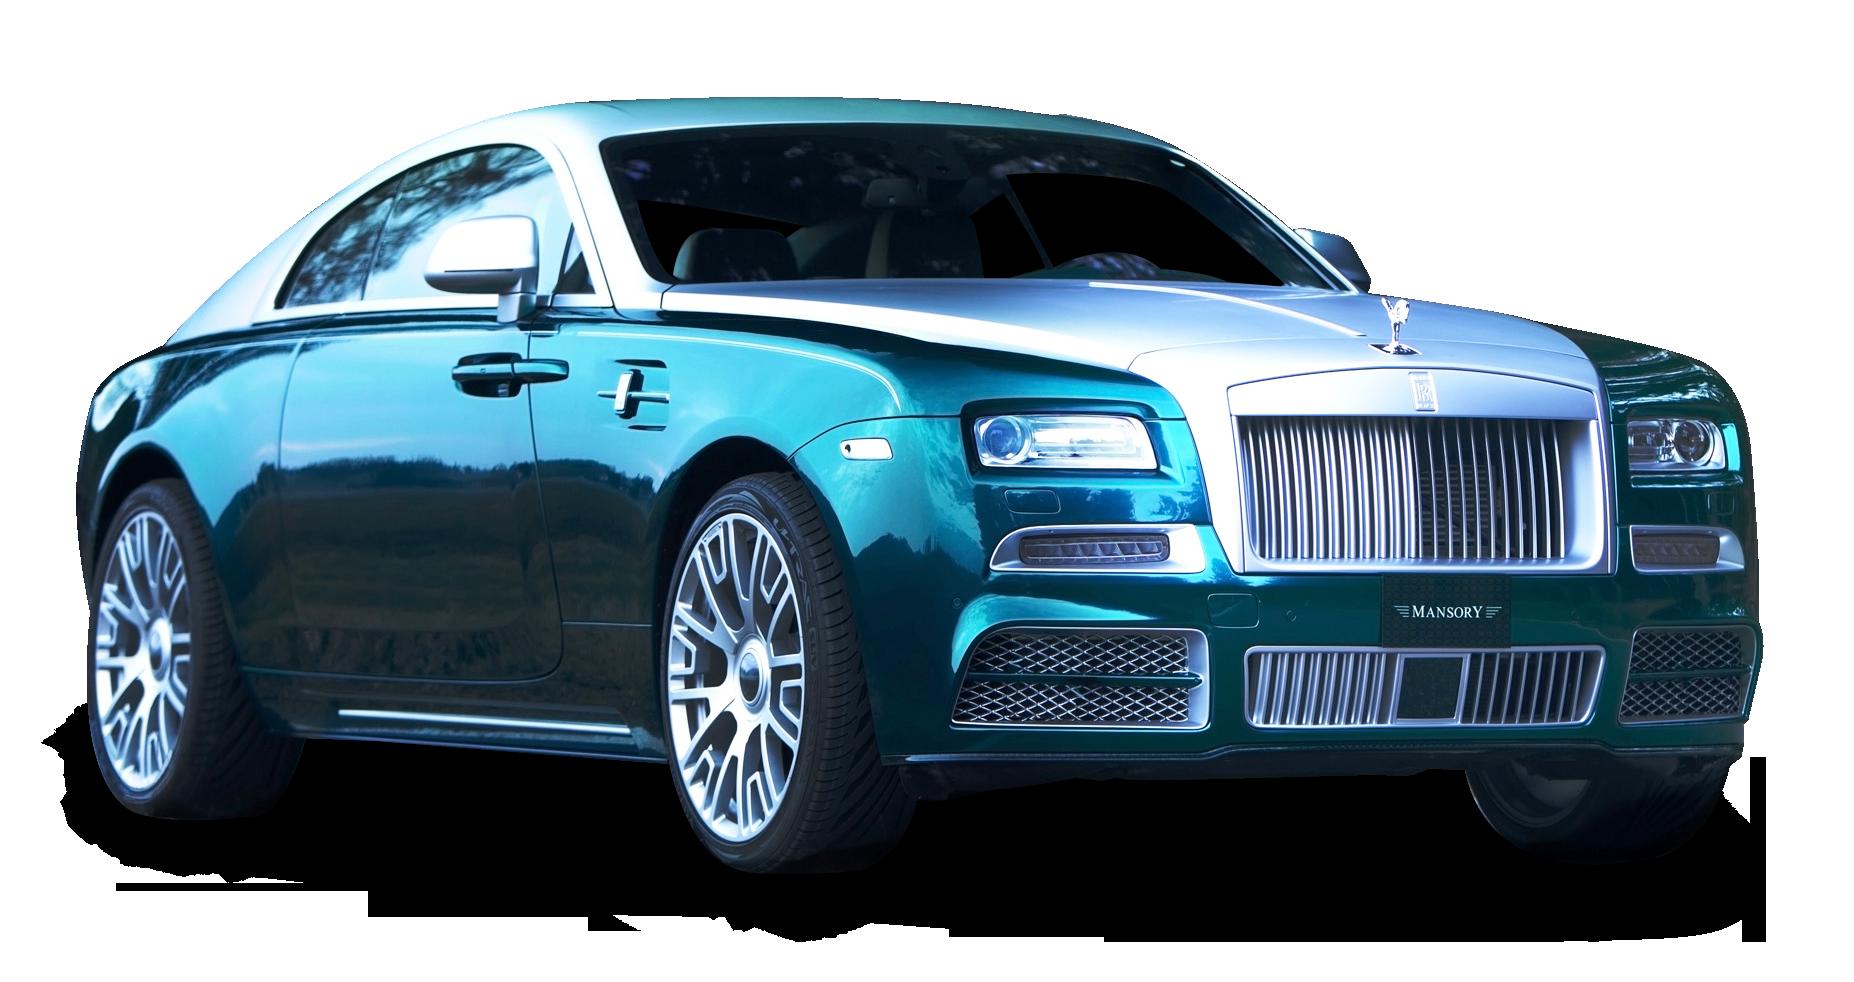 Pin By Charudeal On Transportation Rolls Royce Cars Rolls Royce